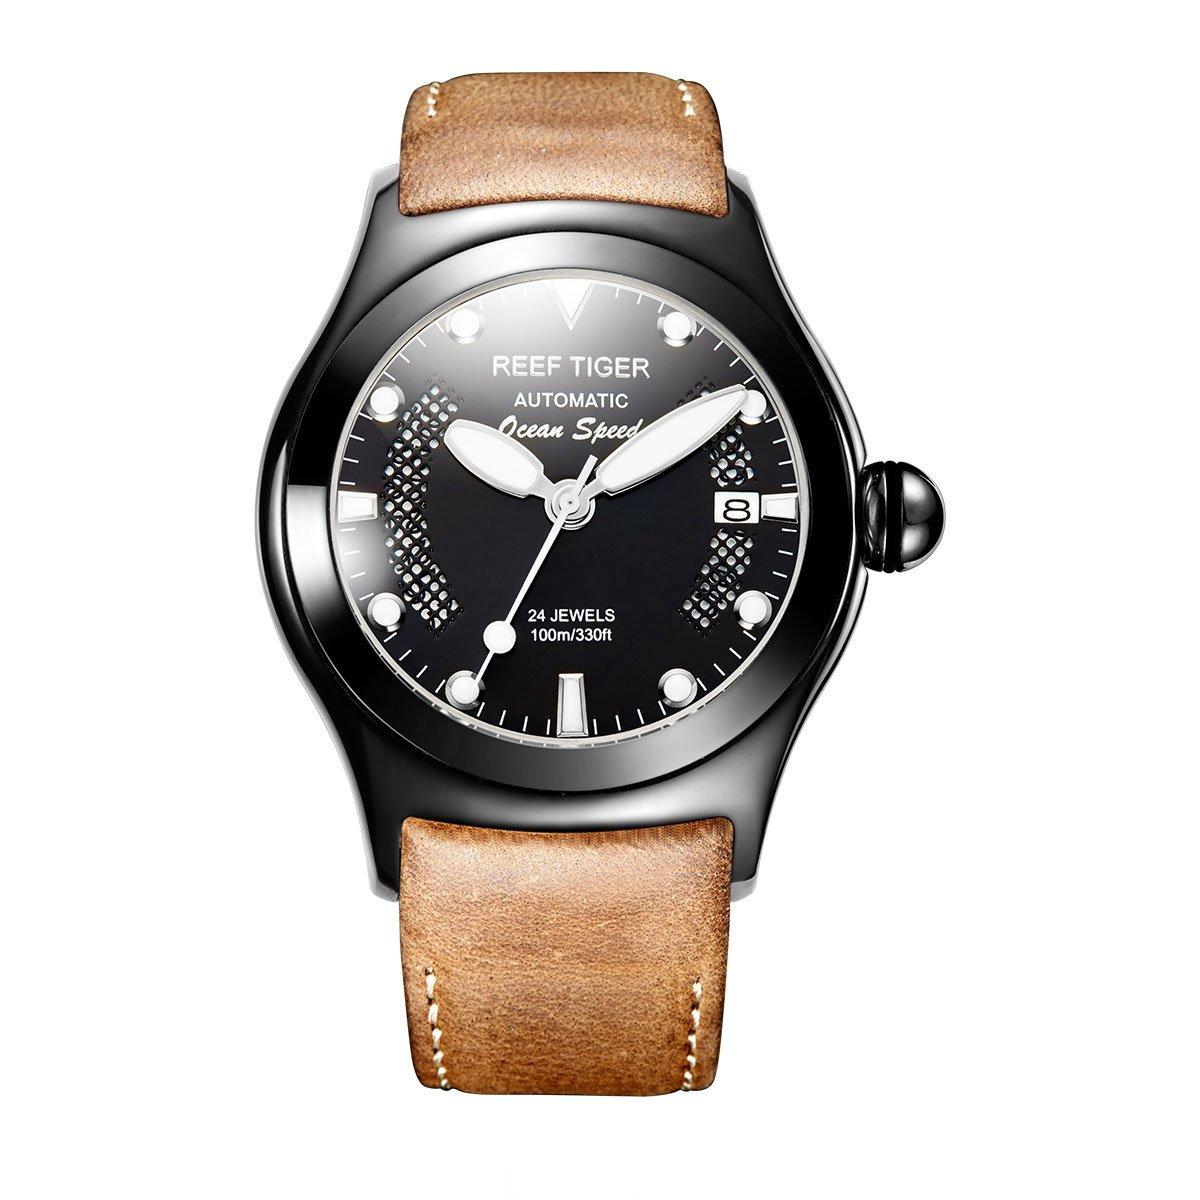 Reef Tiger Sport Watch光マーカーブラックスチール自動Watches with Date rga704 RGA704-BBBW B01FJT2XV0 RGA704-BBBW RGA704-BBBW